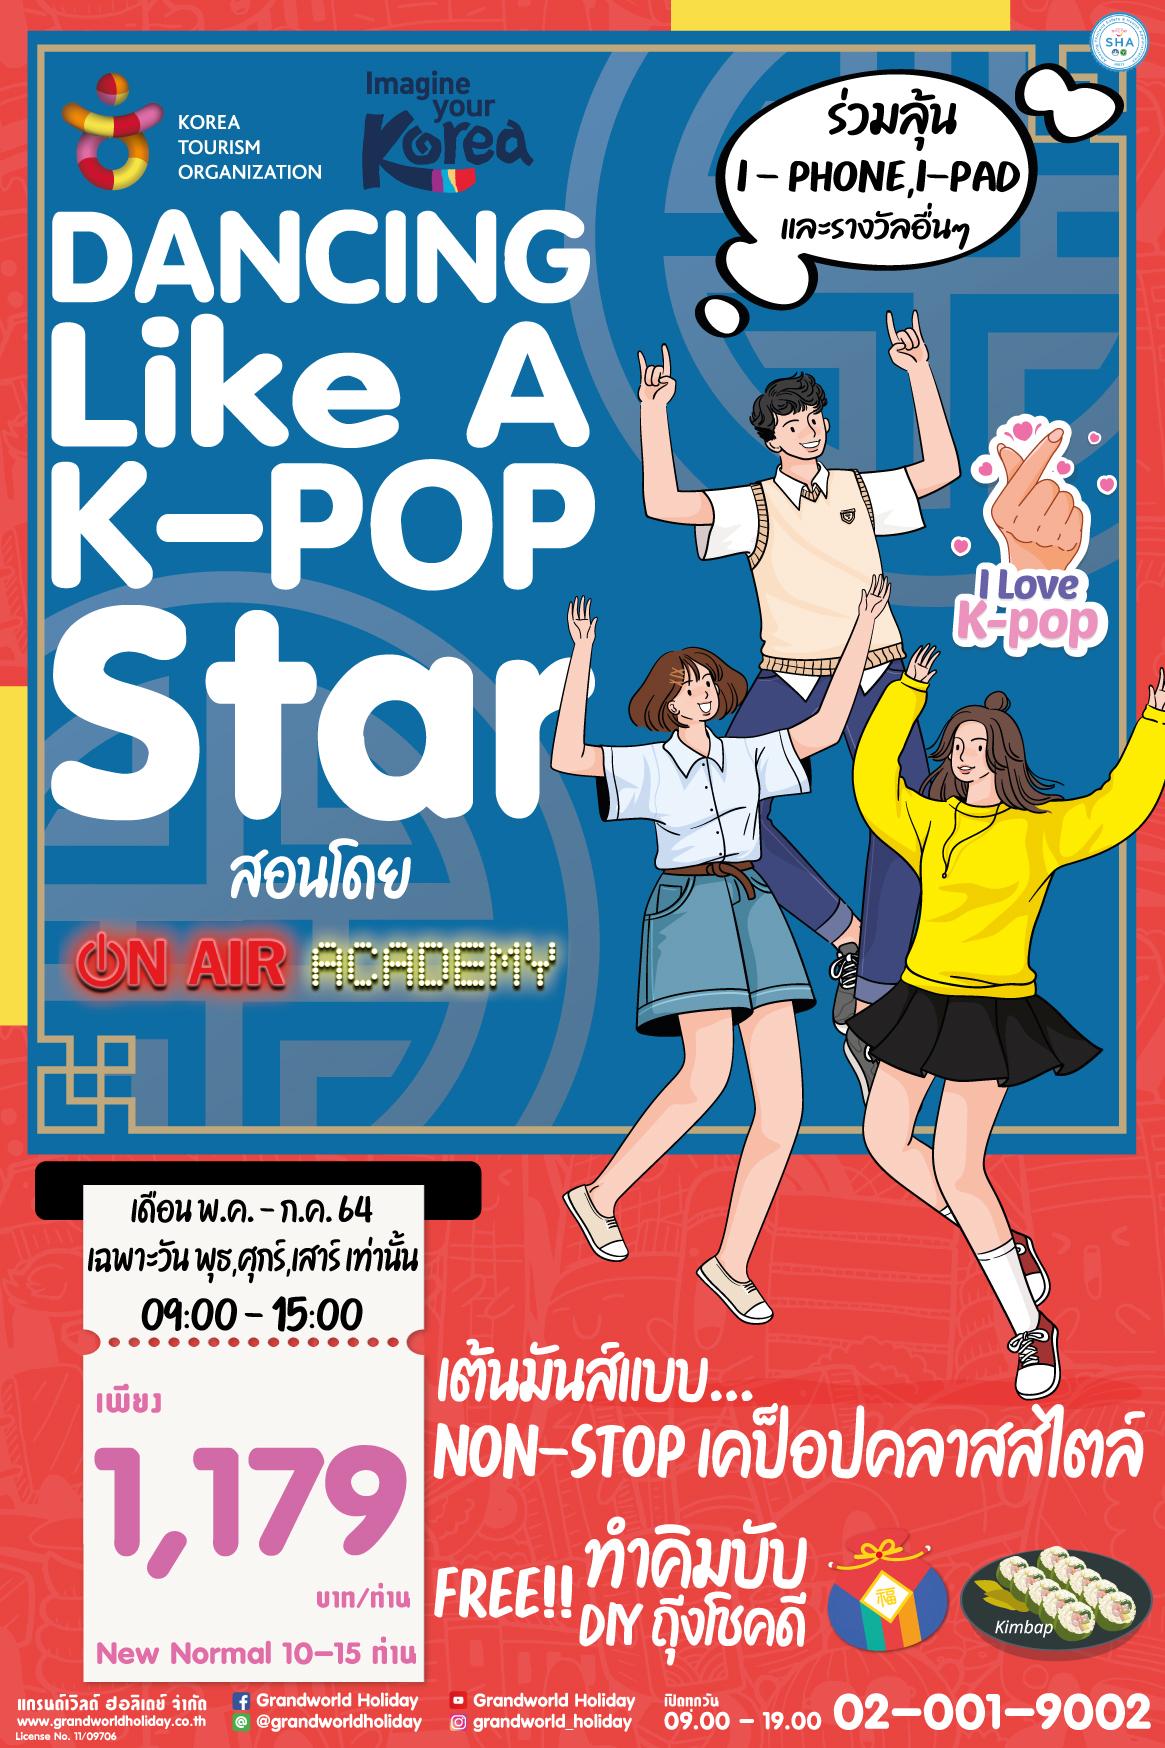 GWH Korea One Day Dancing like a K-POP star